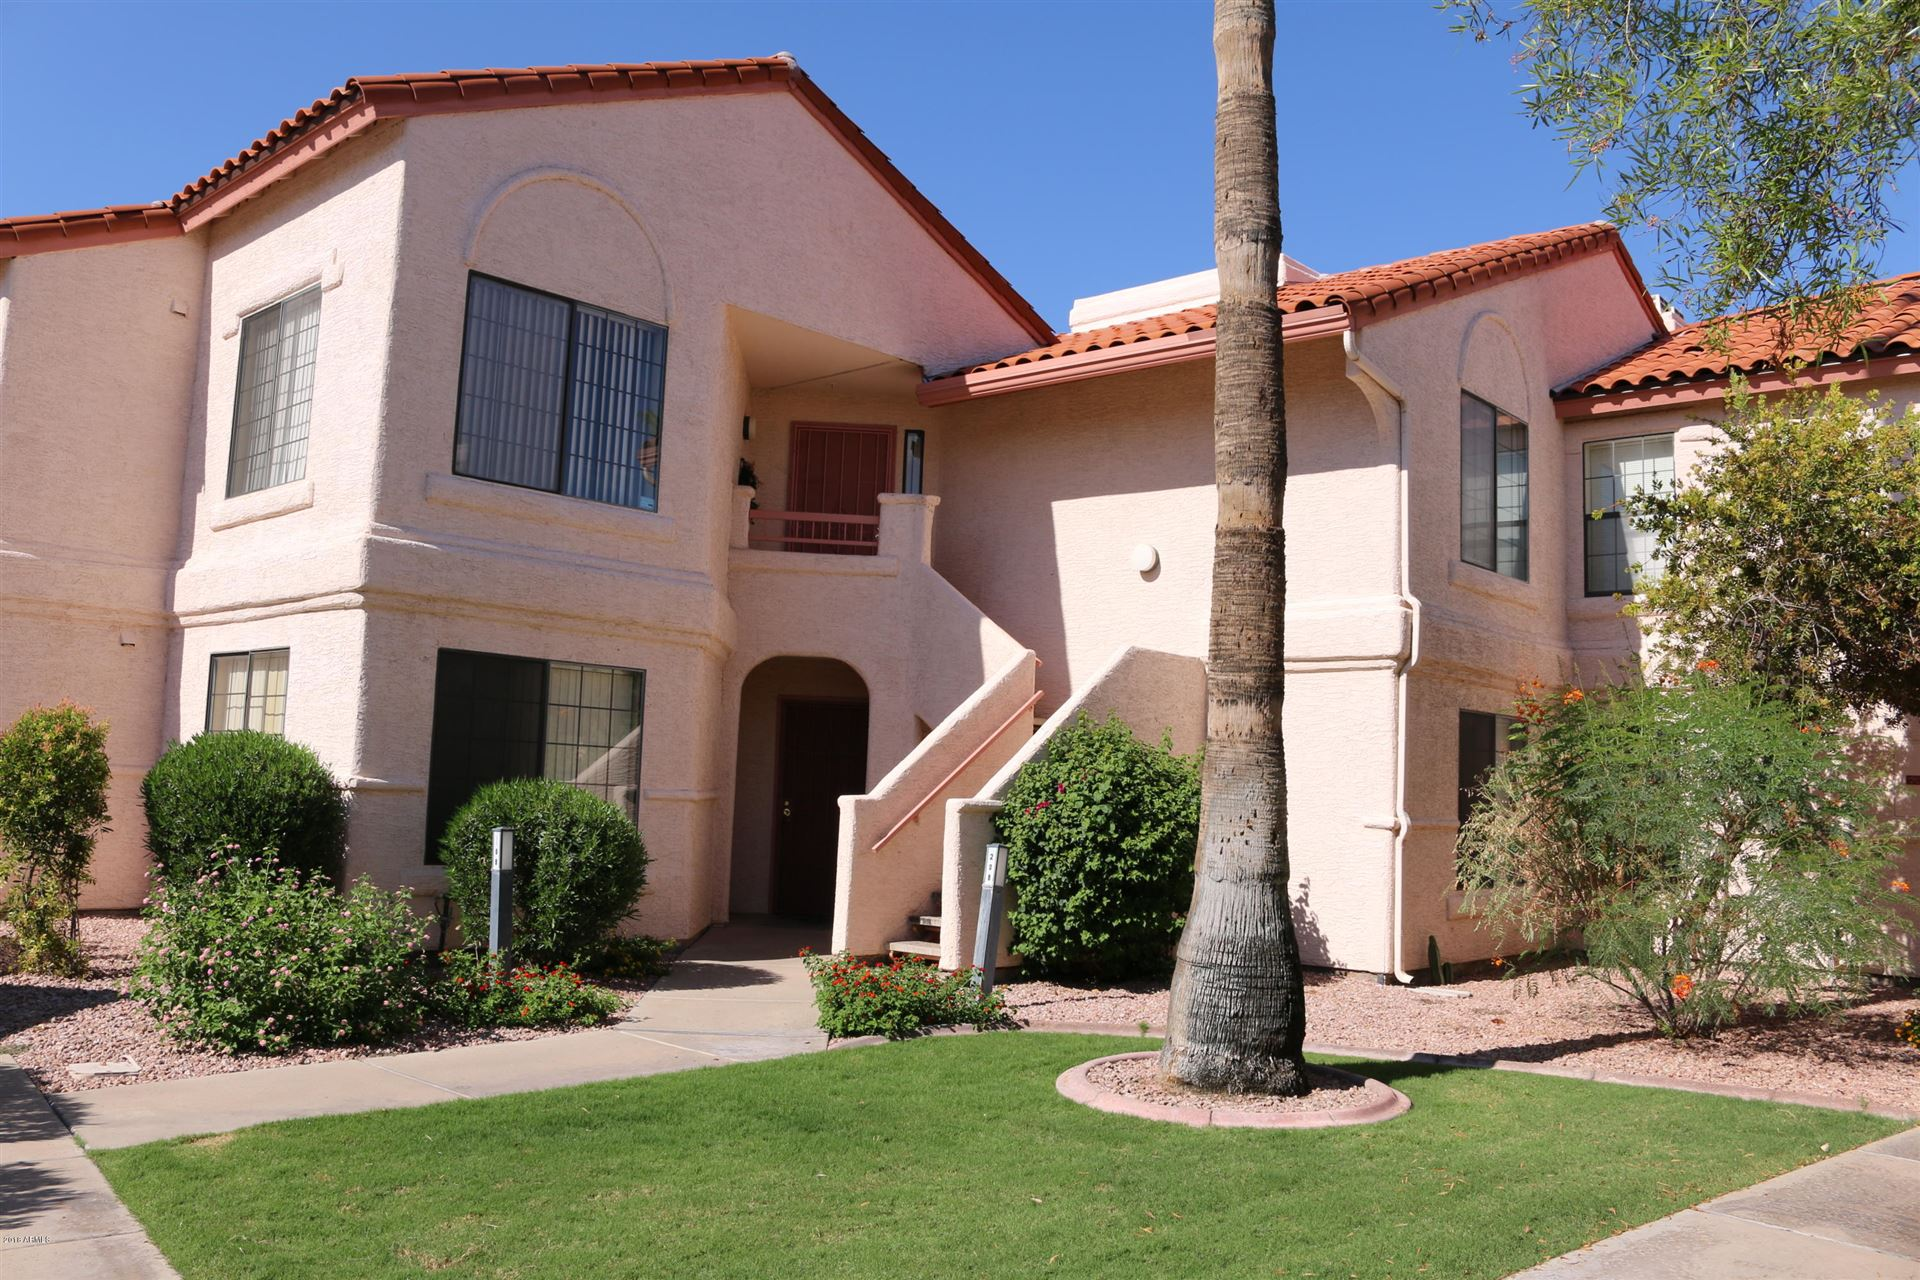 Photo of 9750 N 94TH Place #208, Scottsdale, AZ 85258 (MLS # 6268356)